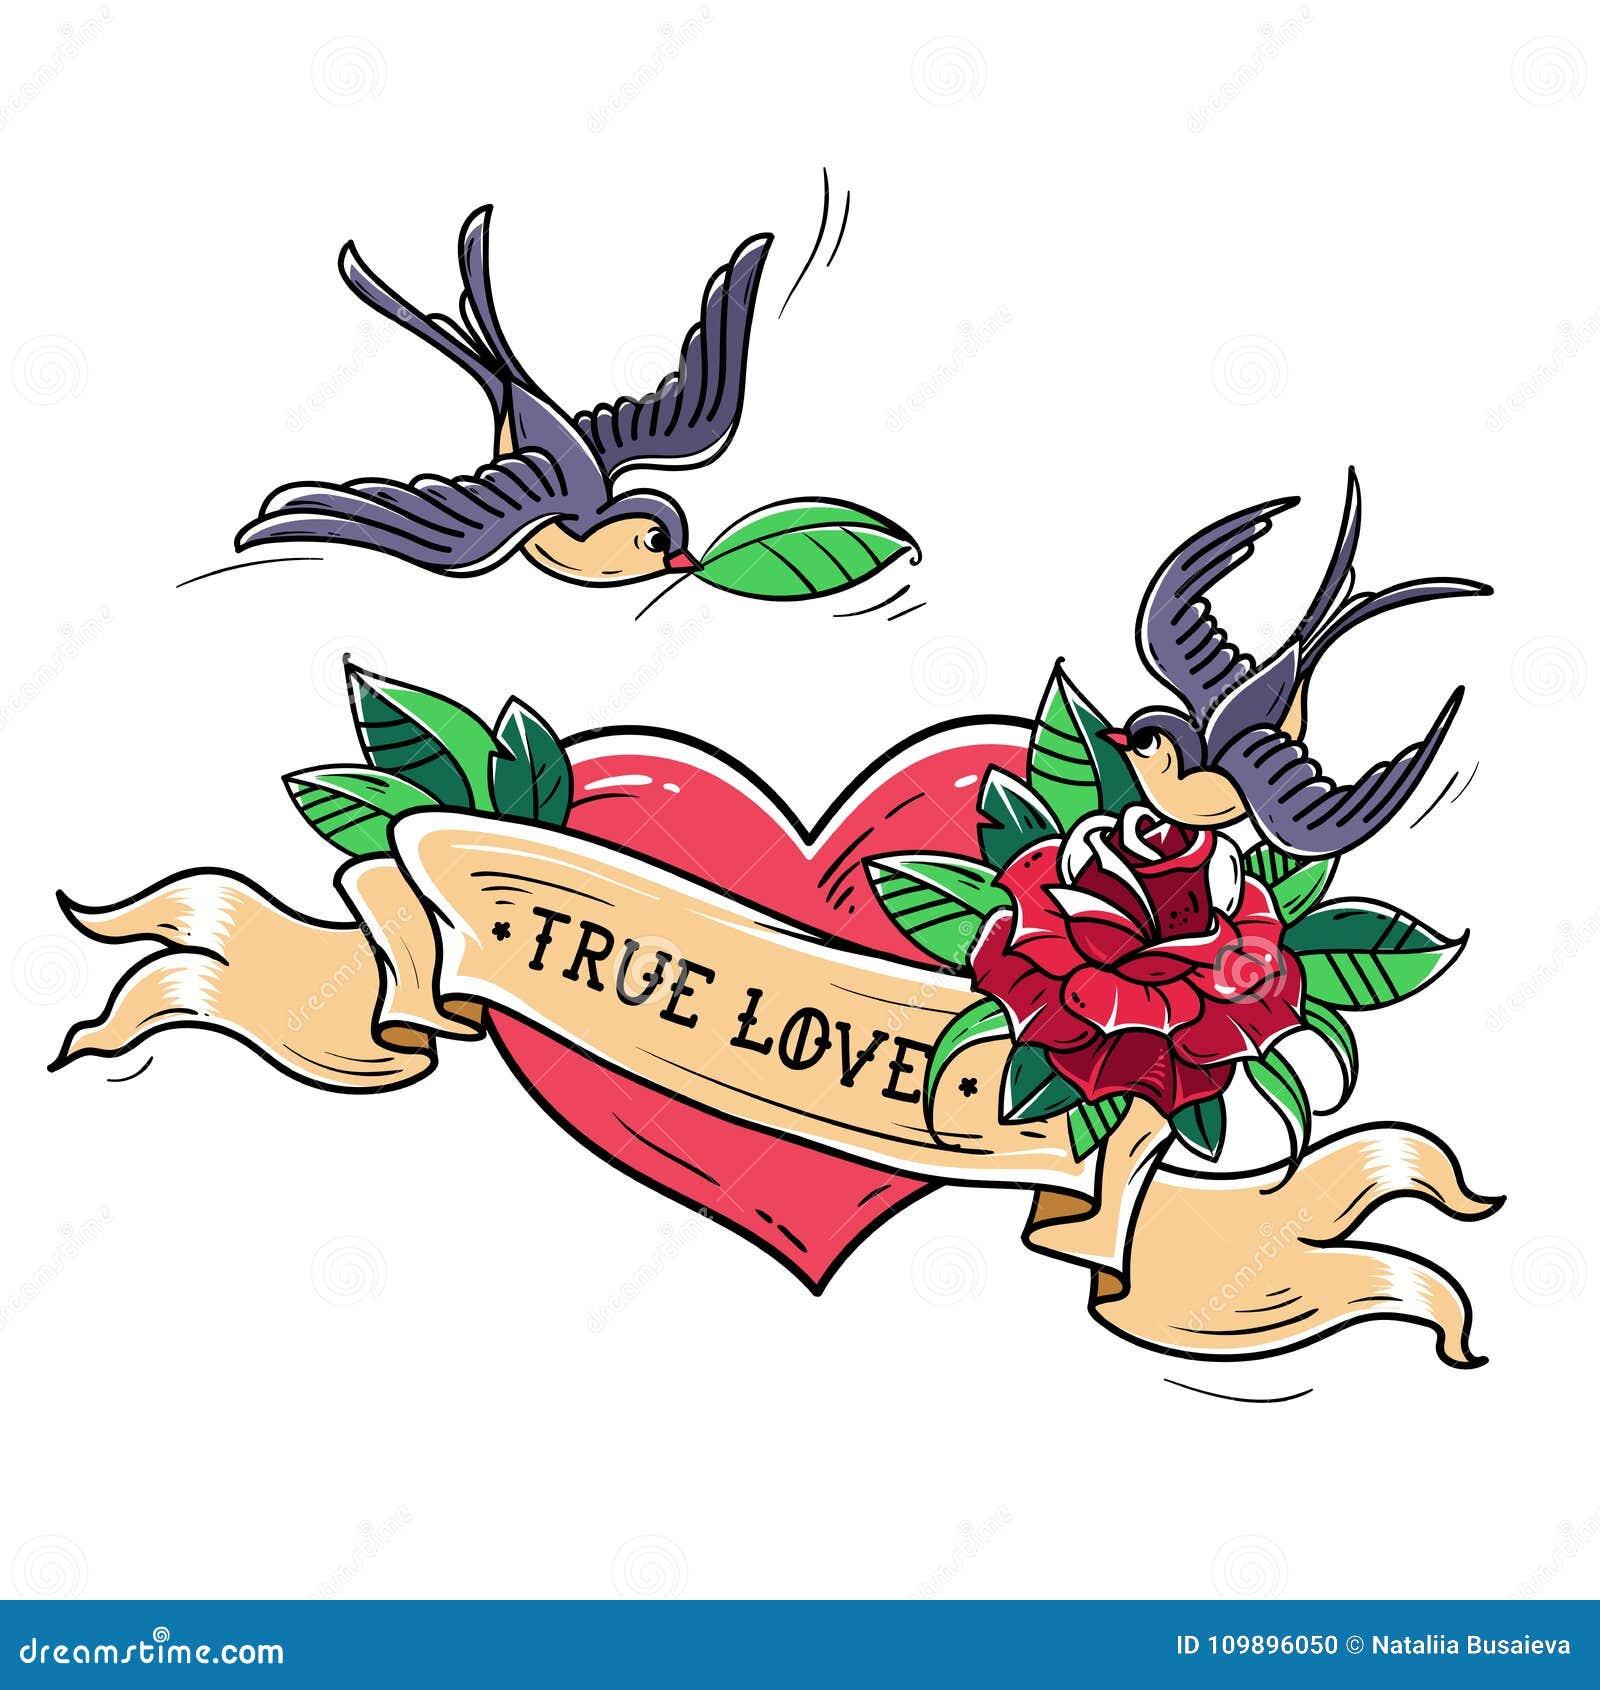 Tattoos on Pinterest | Chinese Symbol Tattoos, Sacred ... |True Love Tattoo Symbol